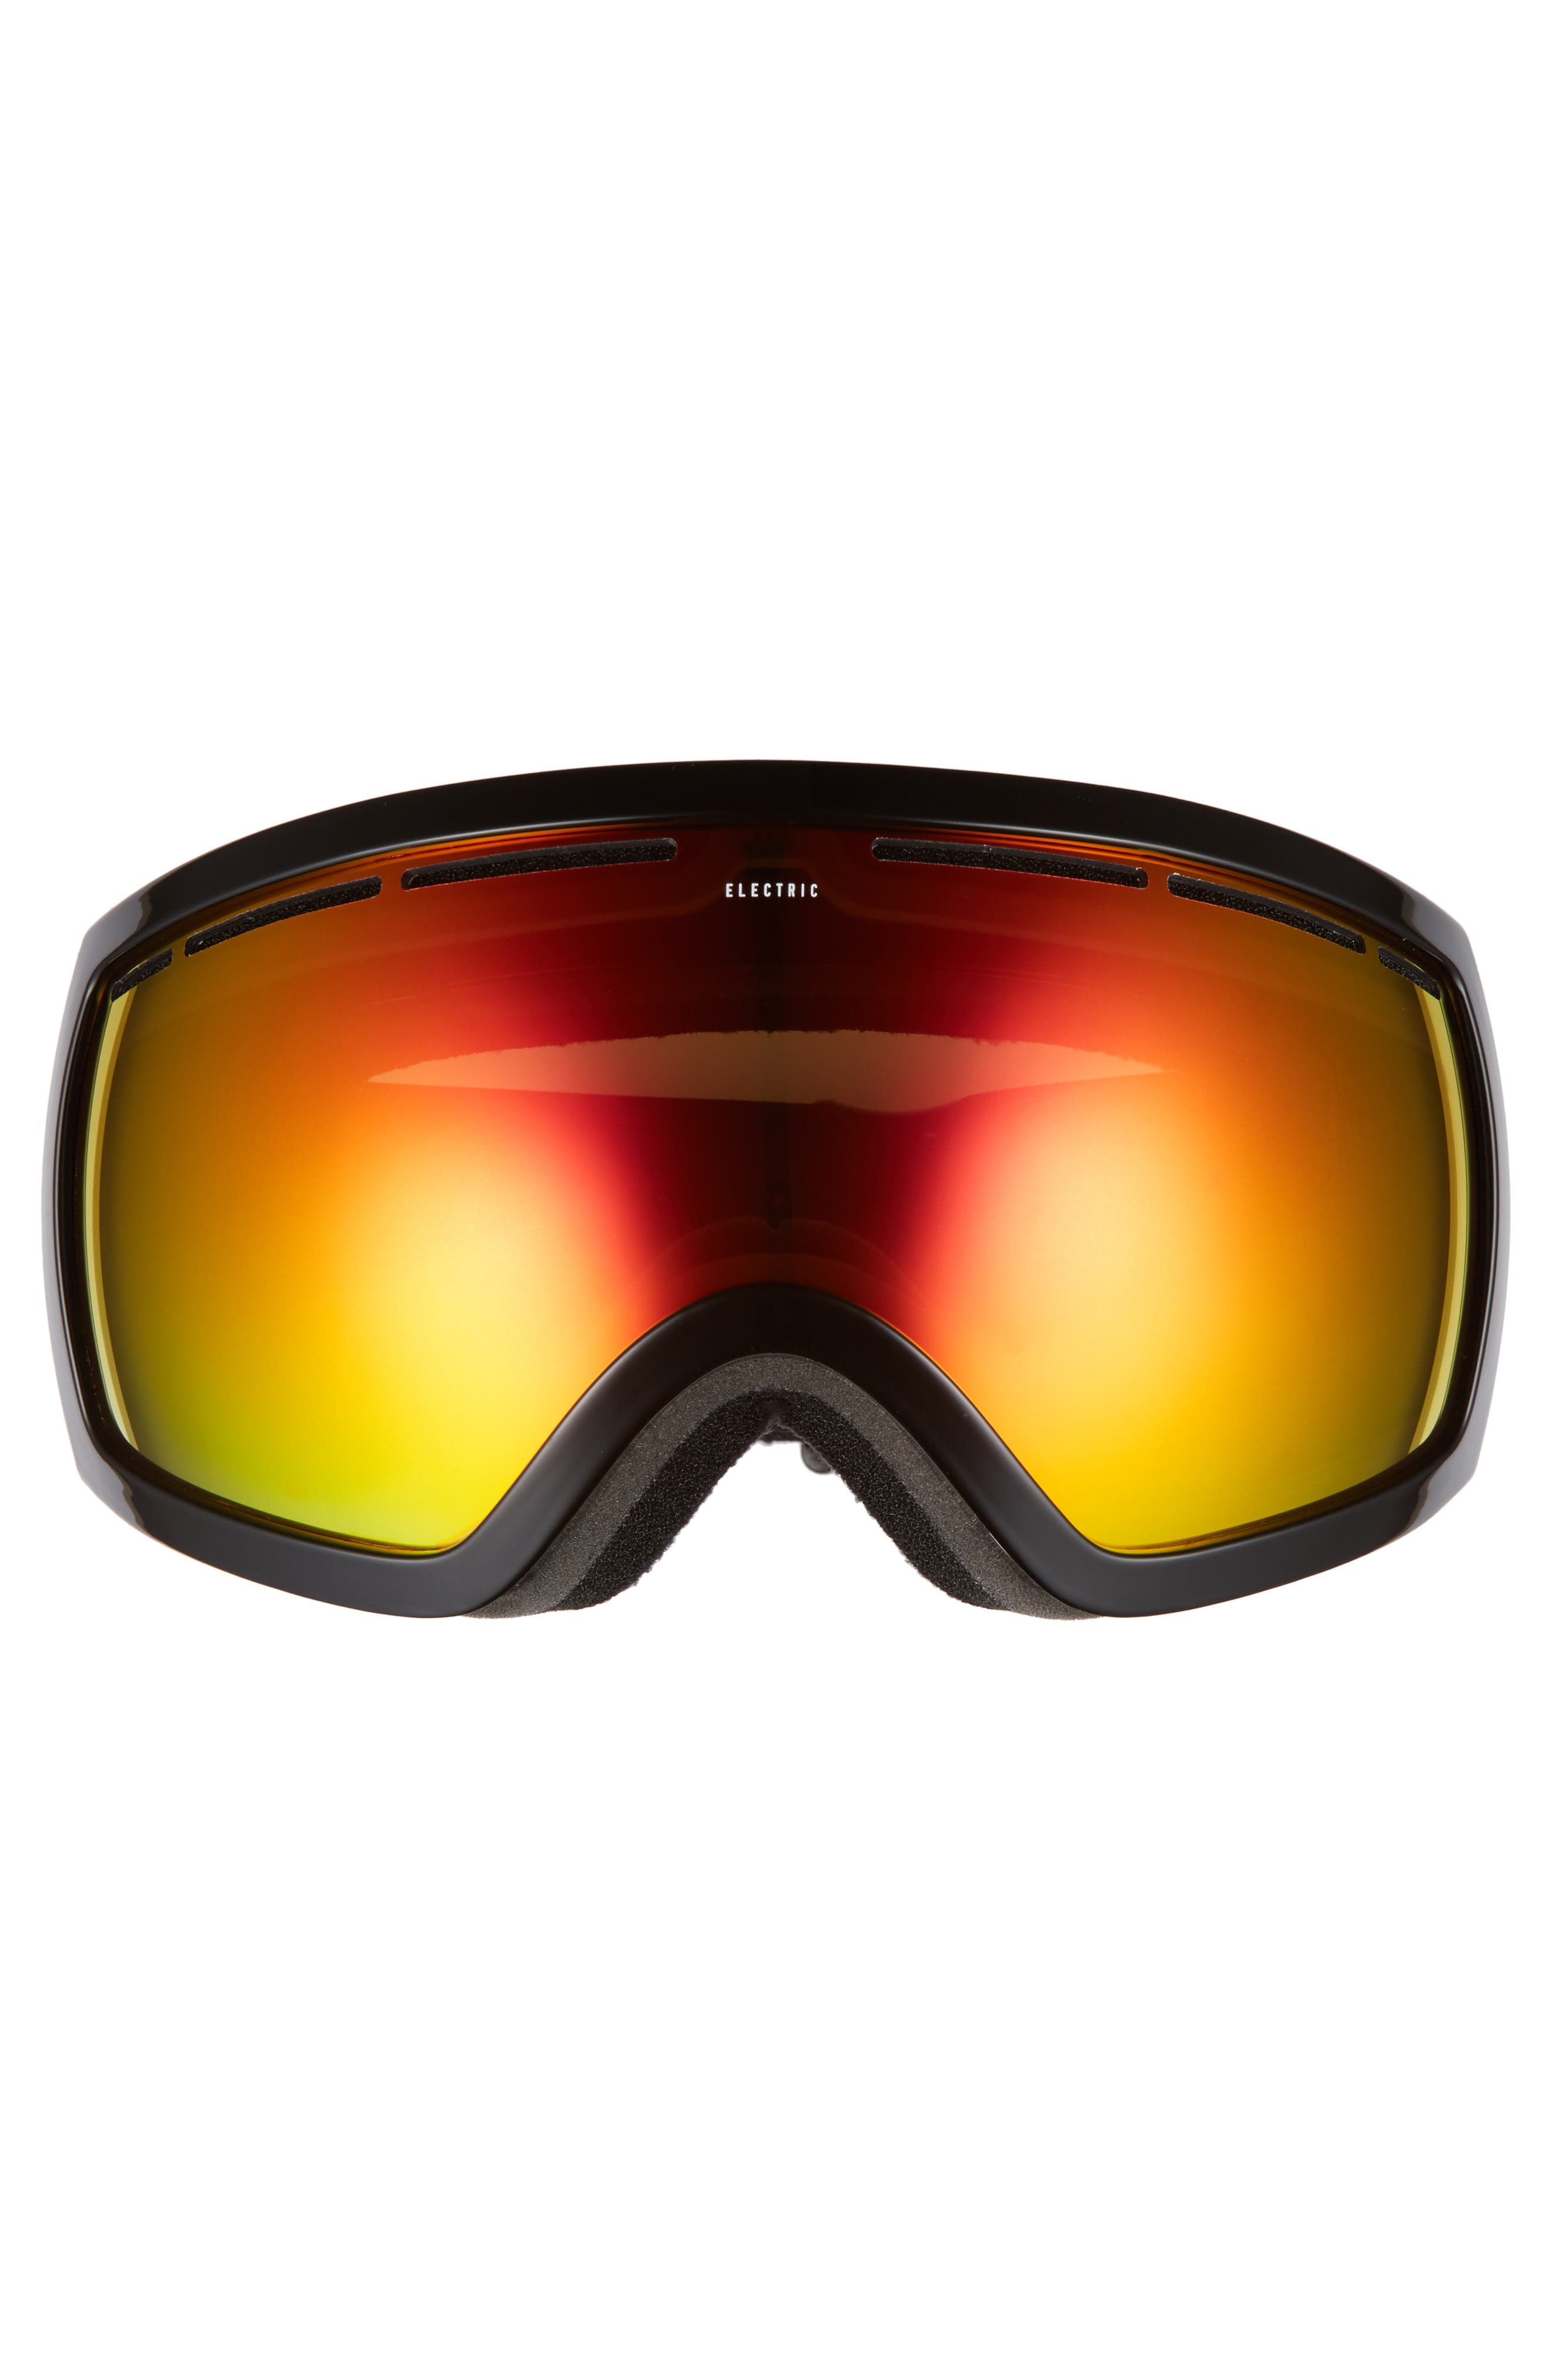 EG2.5 Snow Goggles,                             Alternate thumbnail 13, color,